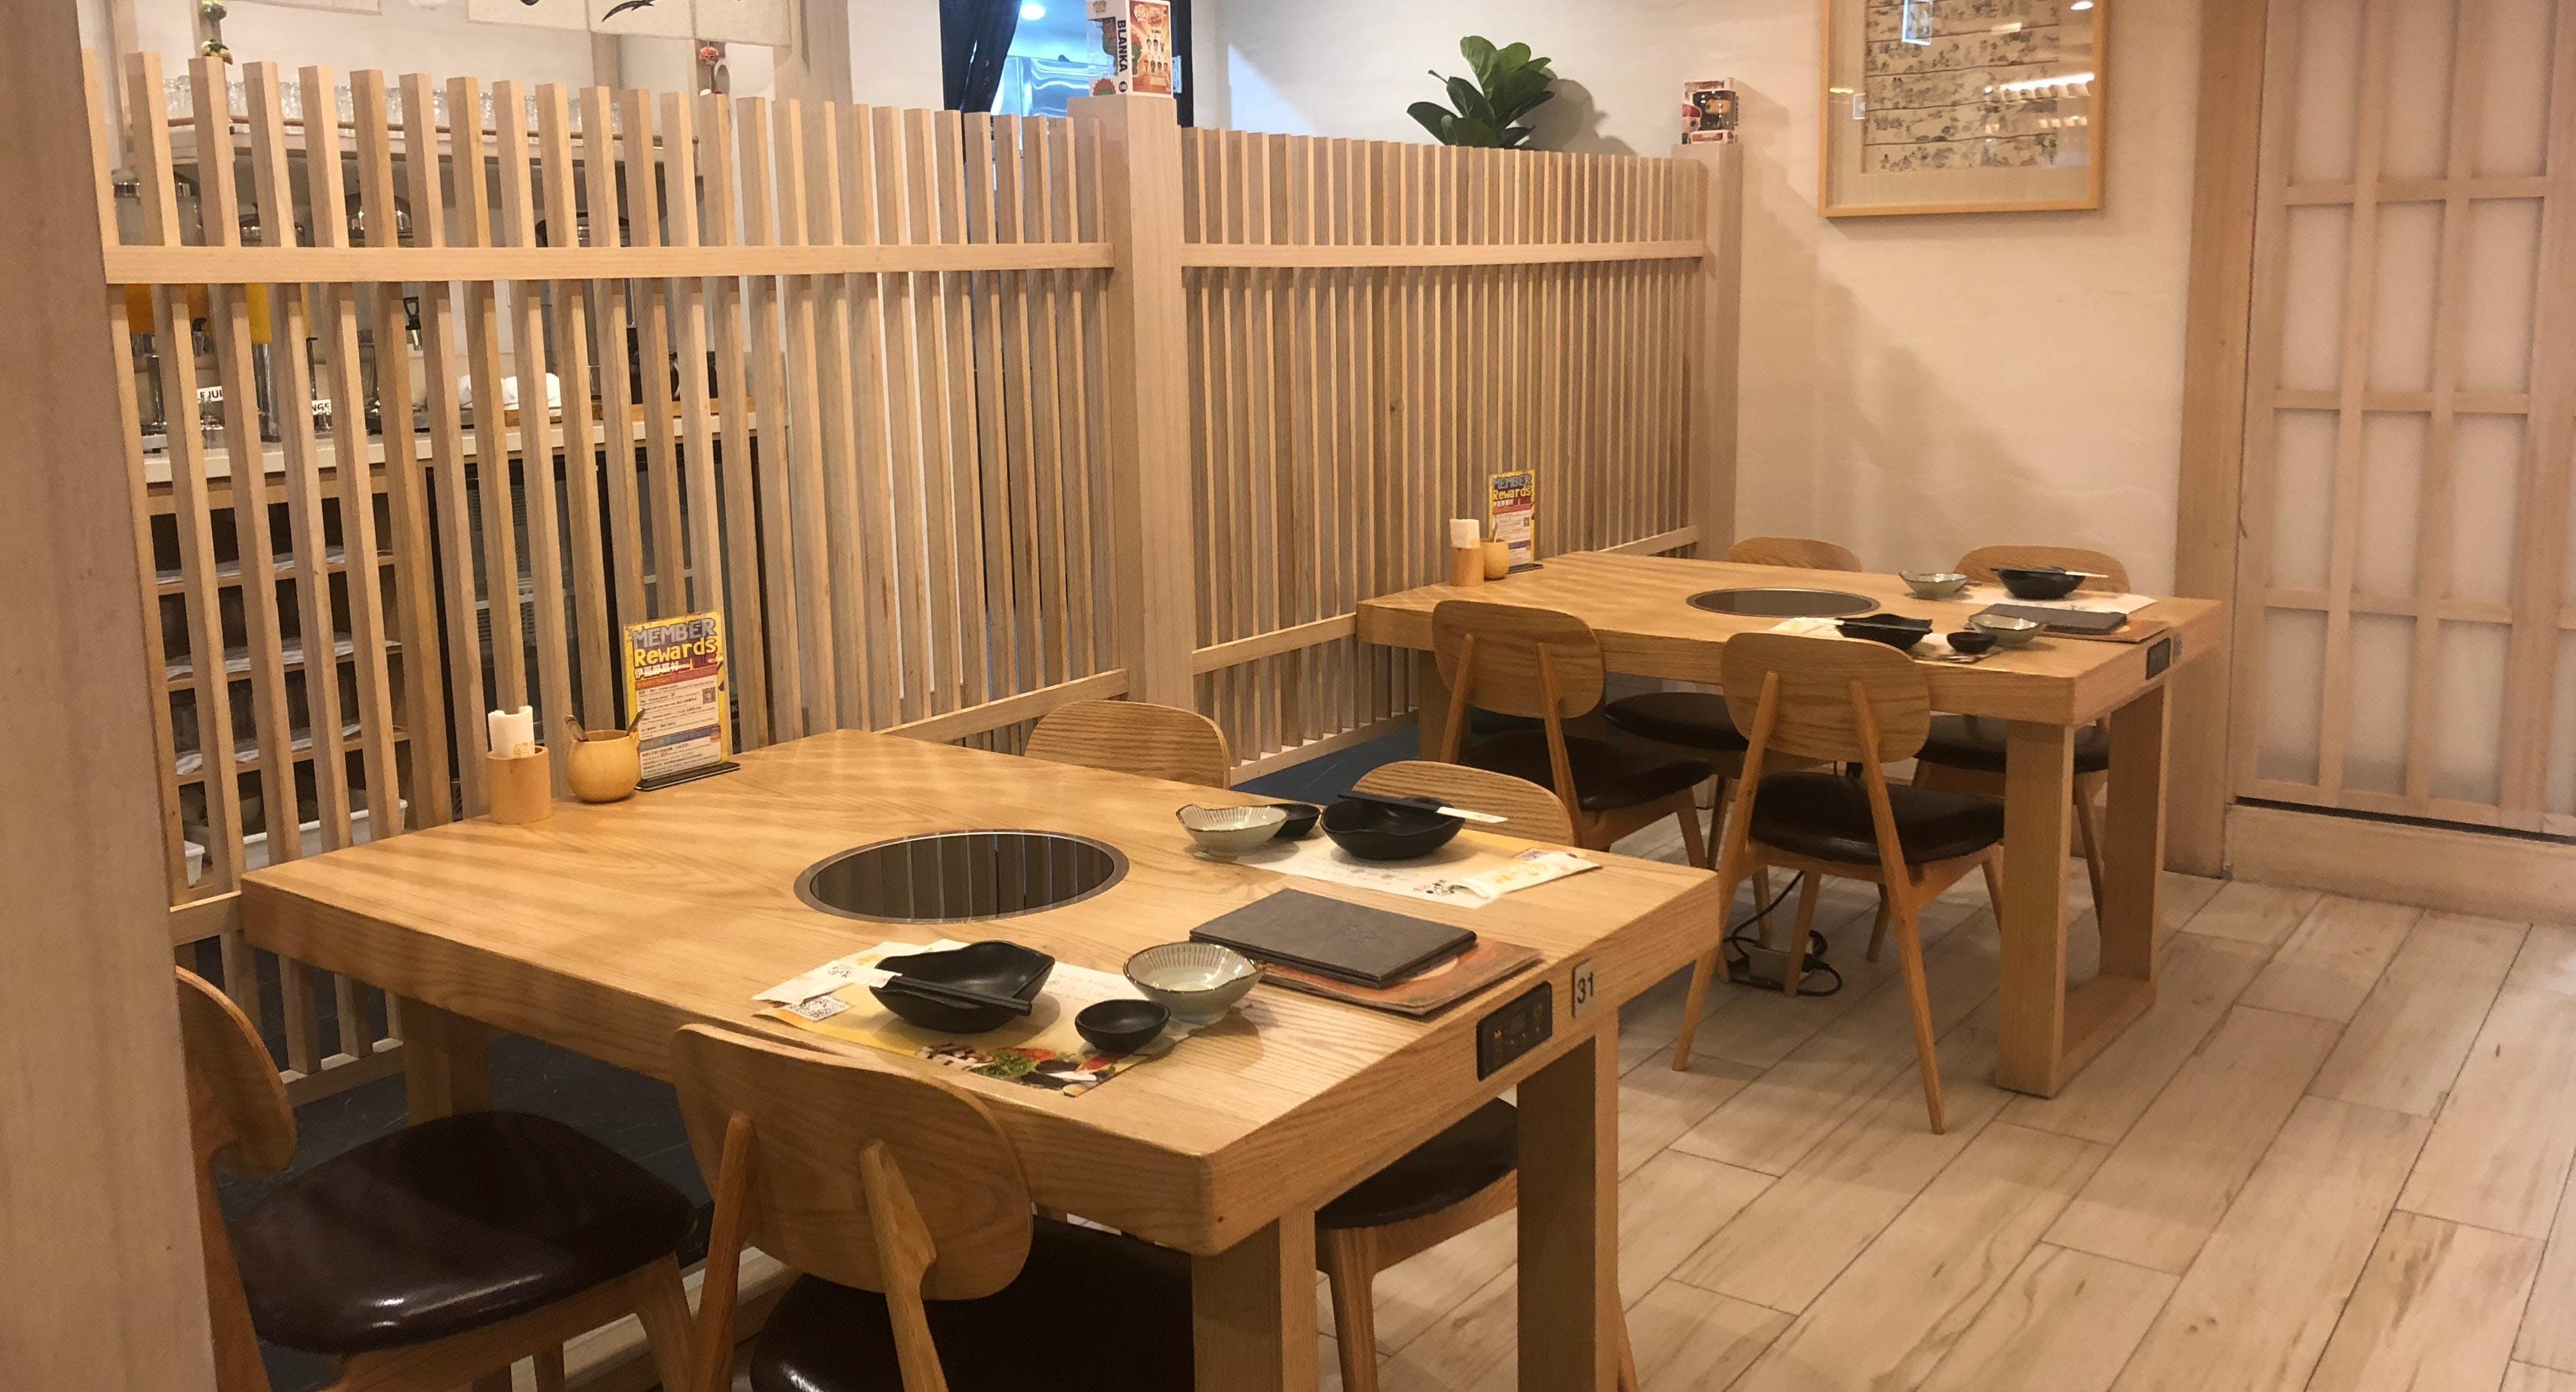 Izu Yasaimaru Japanese Restaurant 伊豆野菜村 Sydney image 3